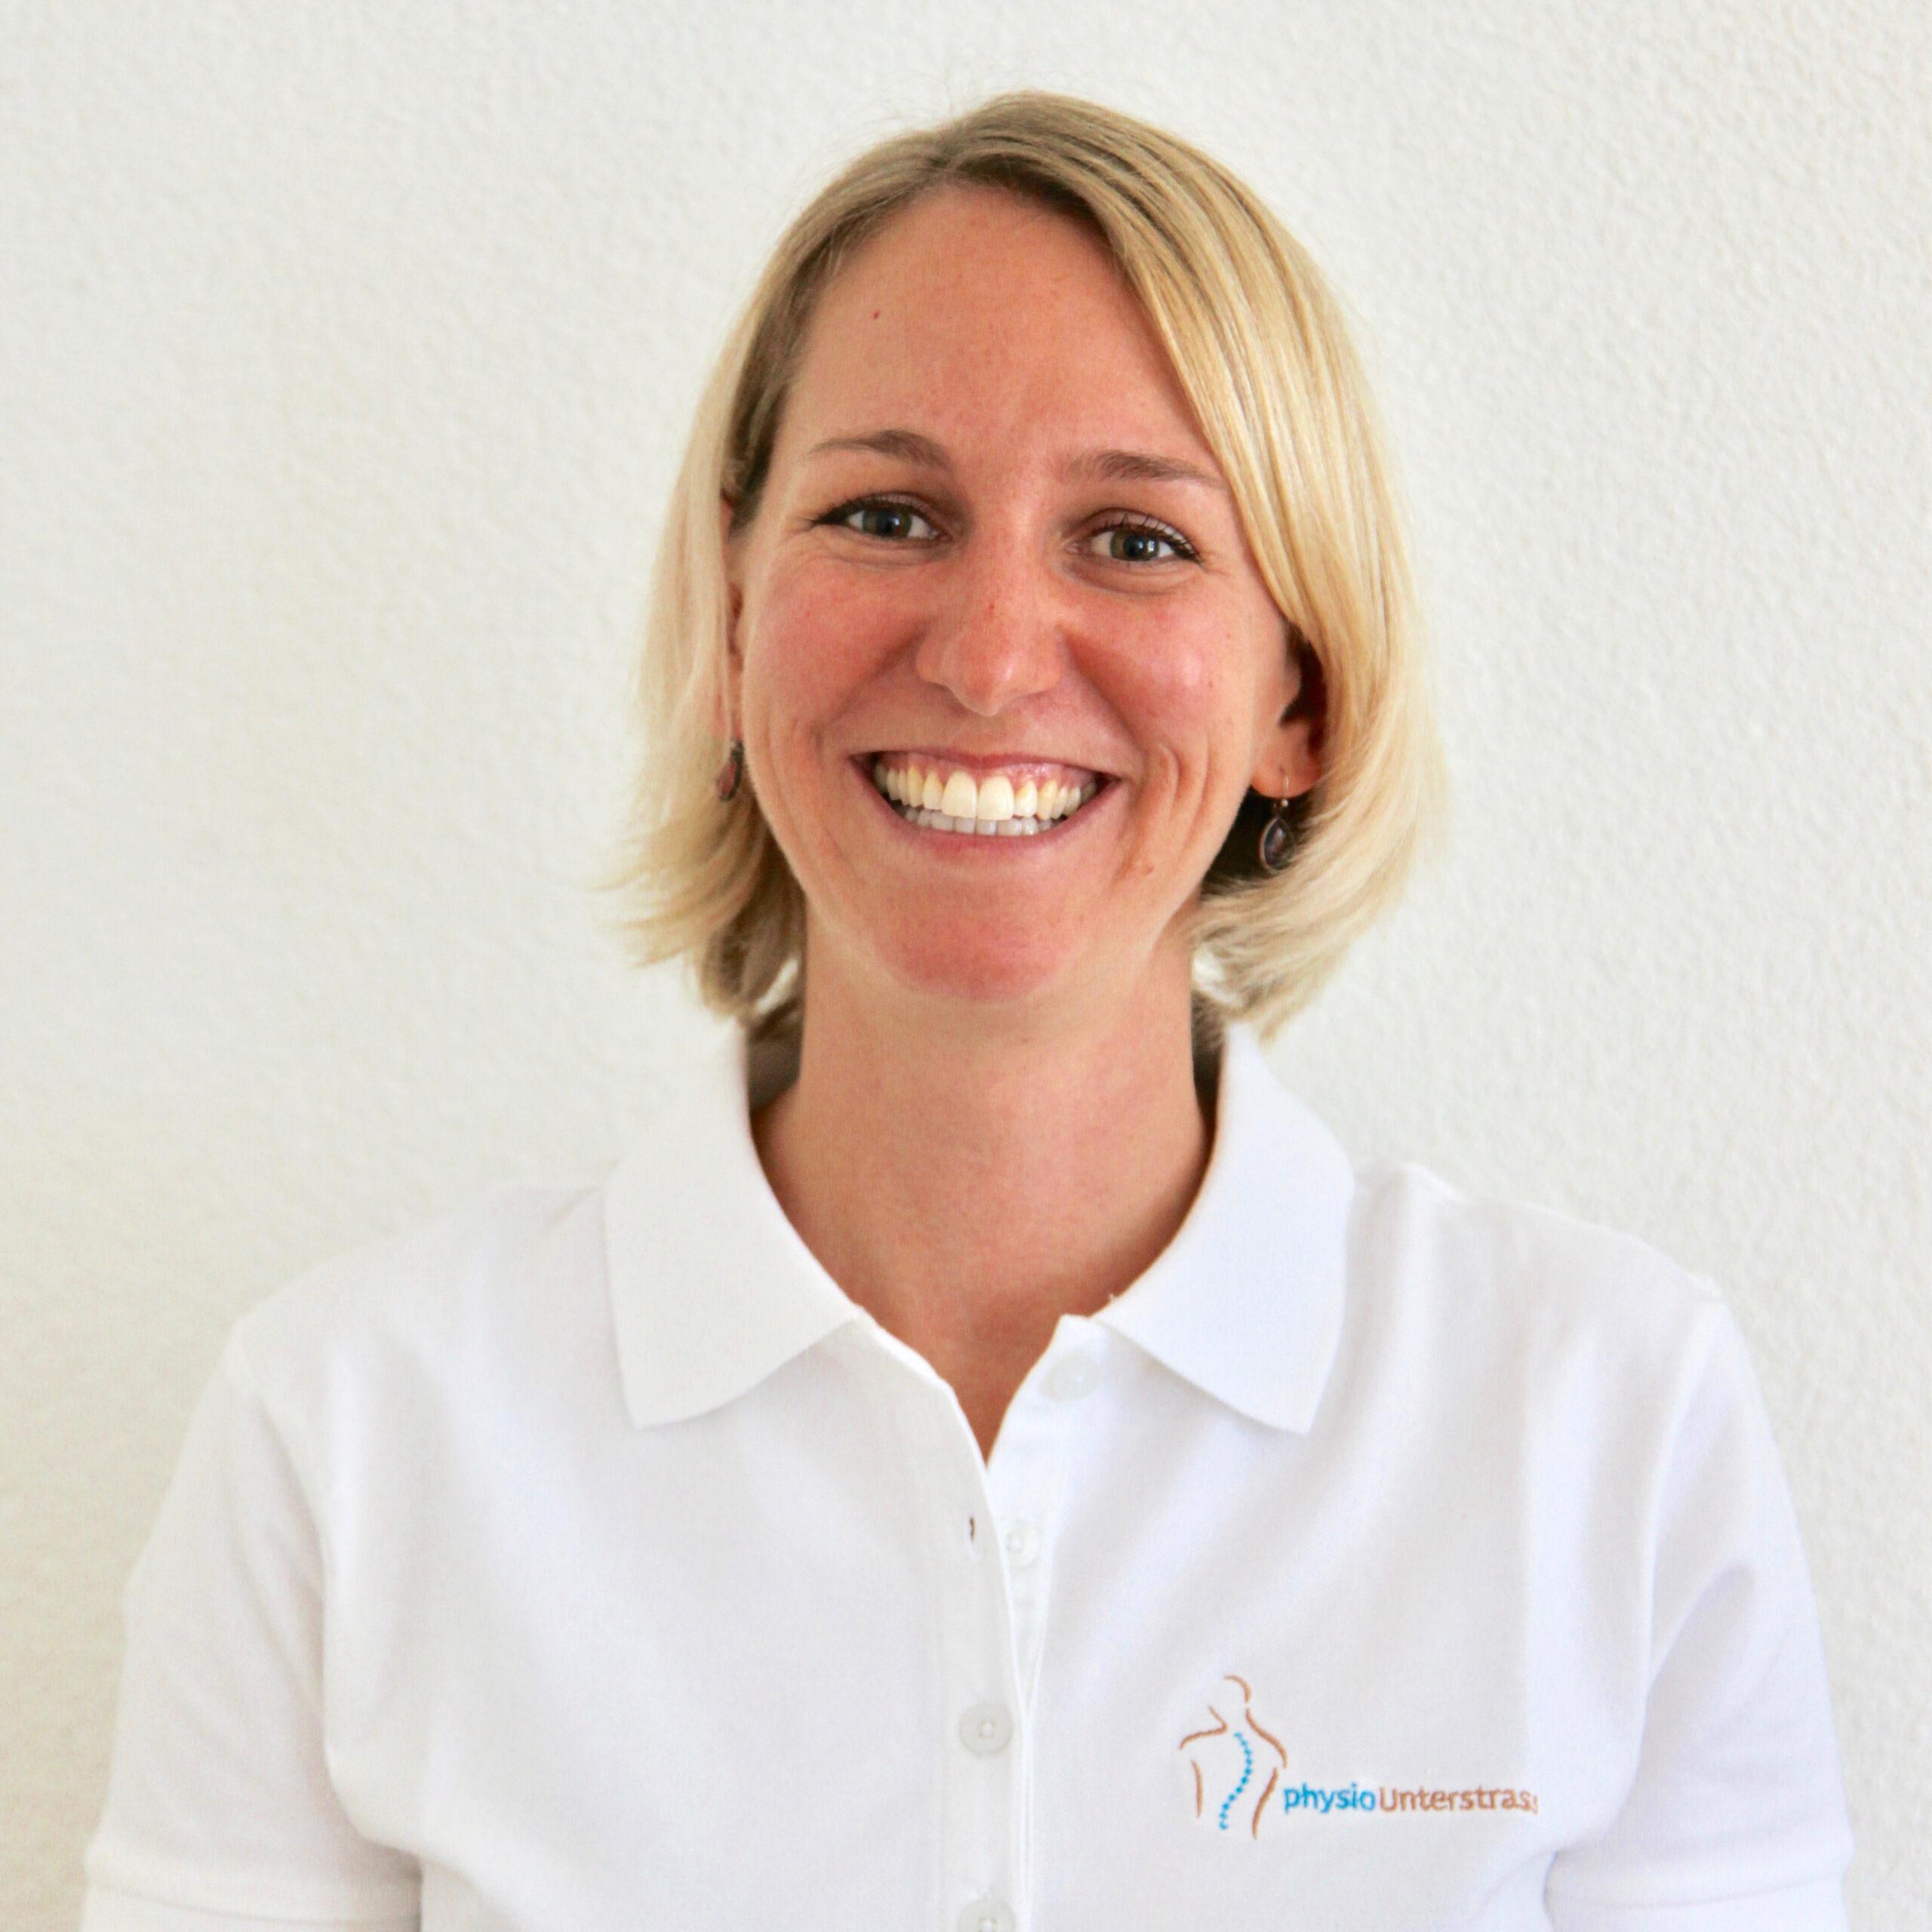 Kathrin Grötsch, Physiotherapeutin Zürich, PhysioUnterstrass Zürich